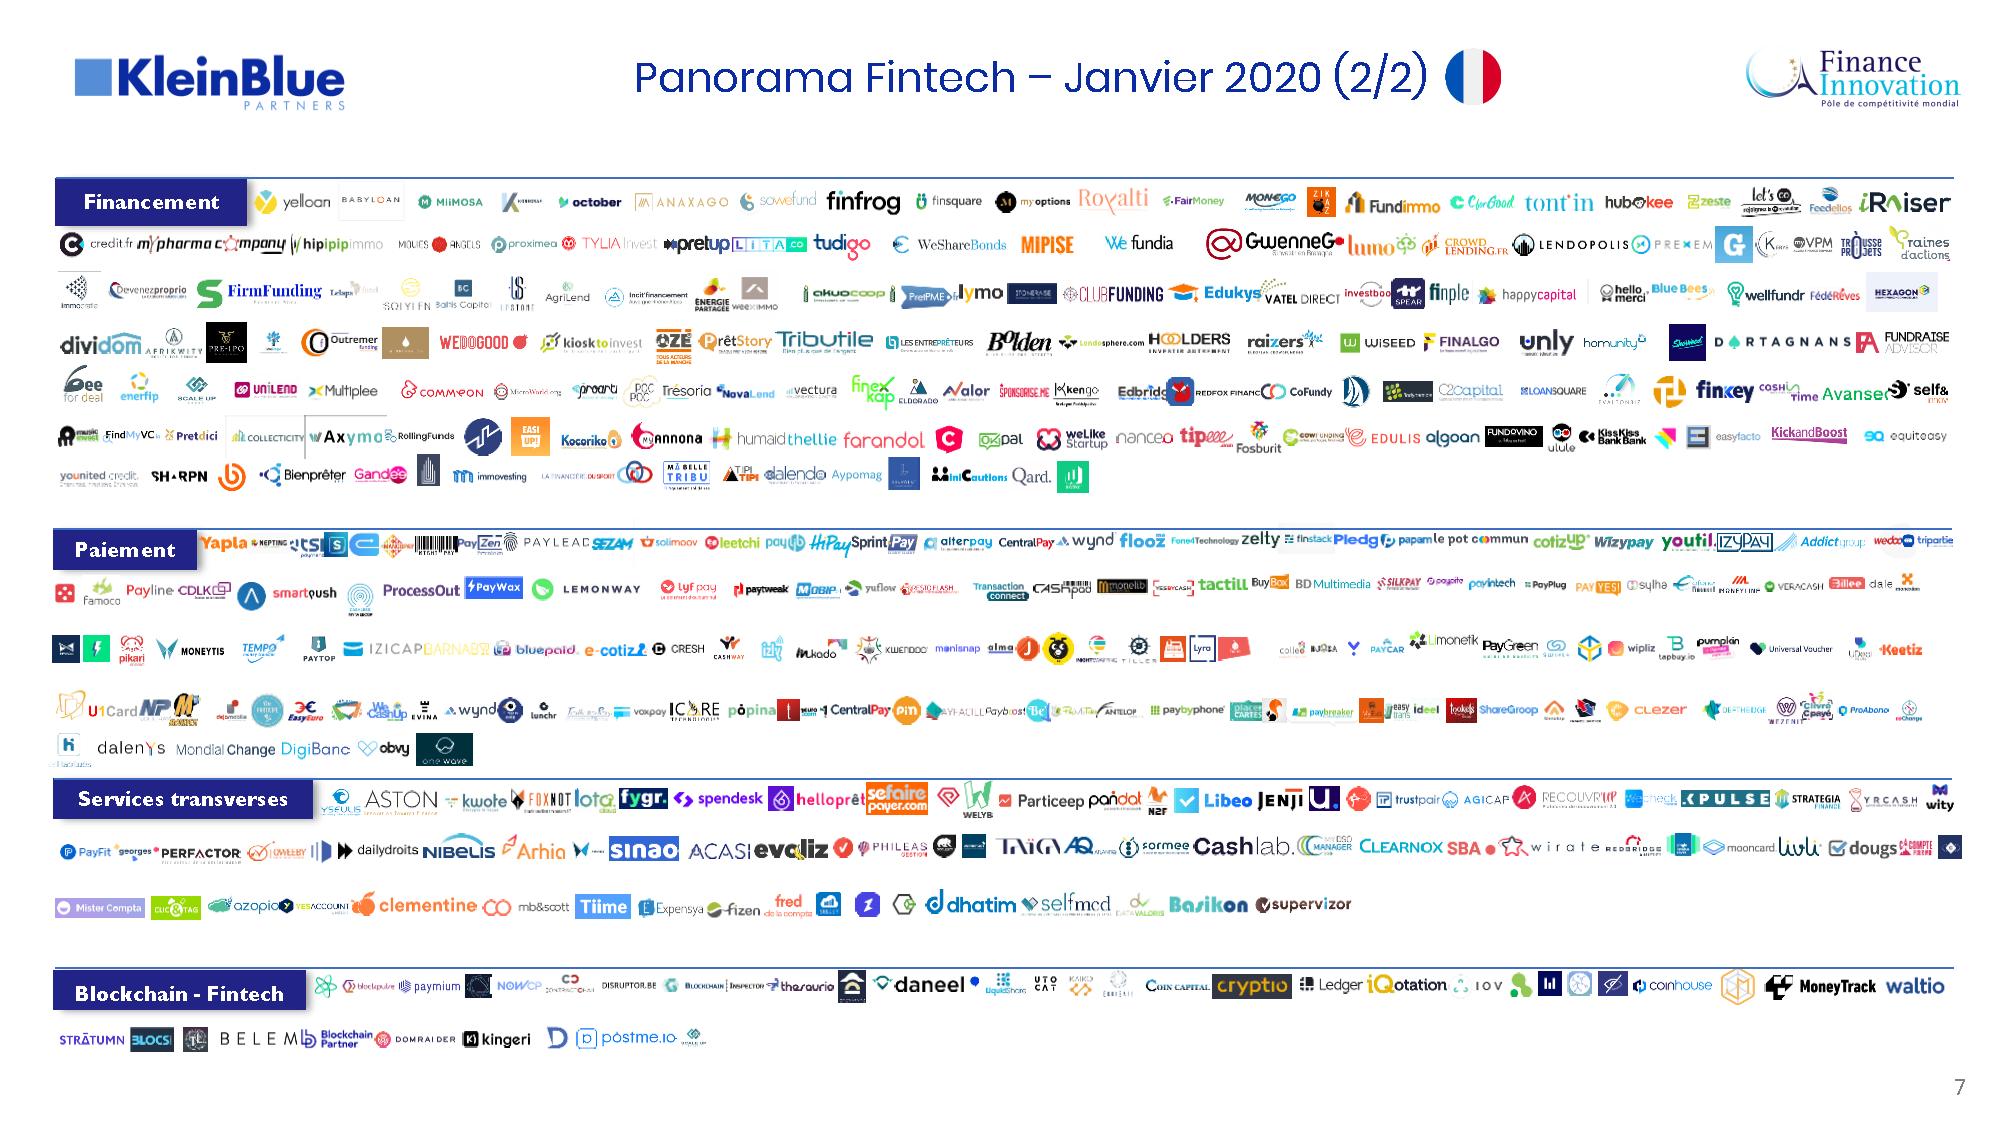 Panorama Finance Innovation et Klein Blue